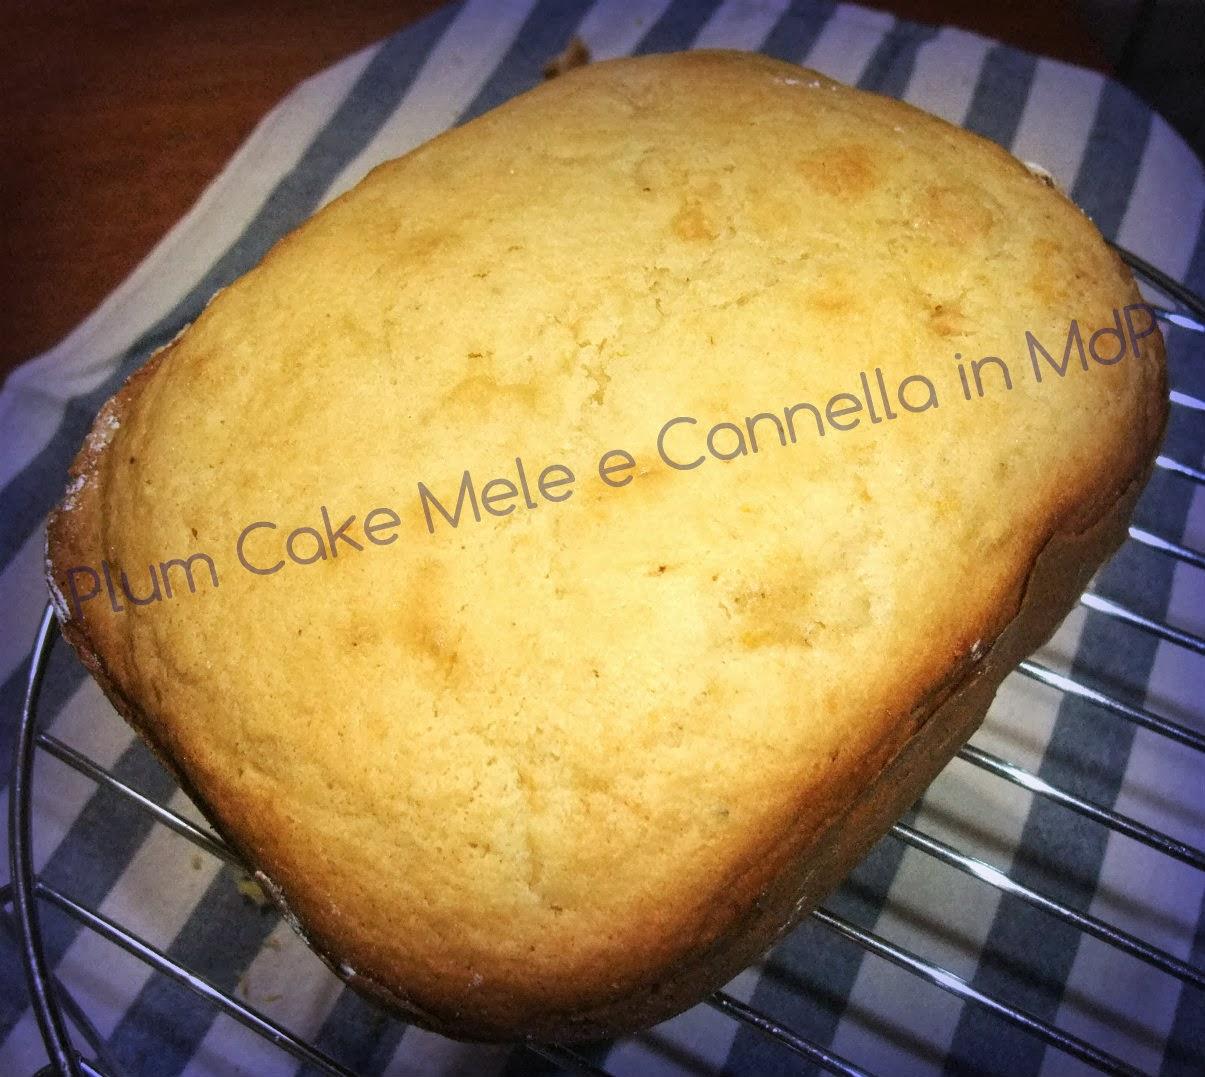 Ricetta Torta Di Mele Macchina Del Pane Kenwood.Tania Senza Glutine Plum Cake Alle Mele E Cannella In Mdp